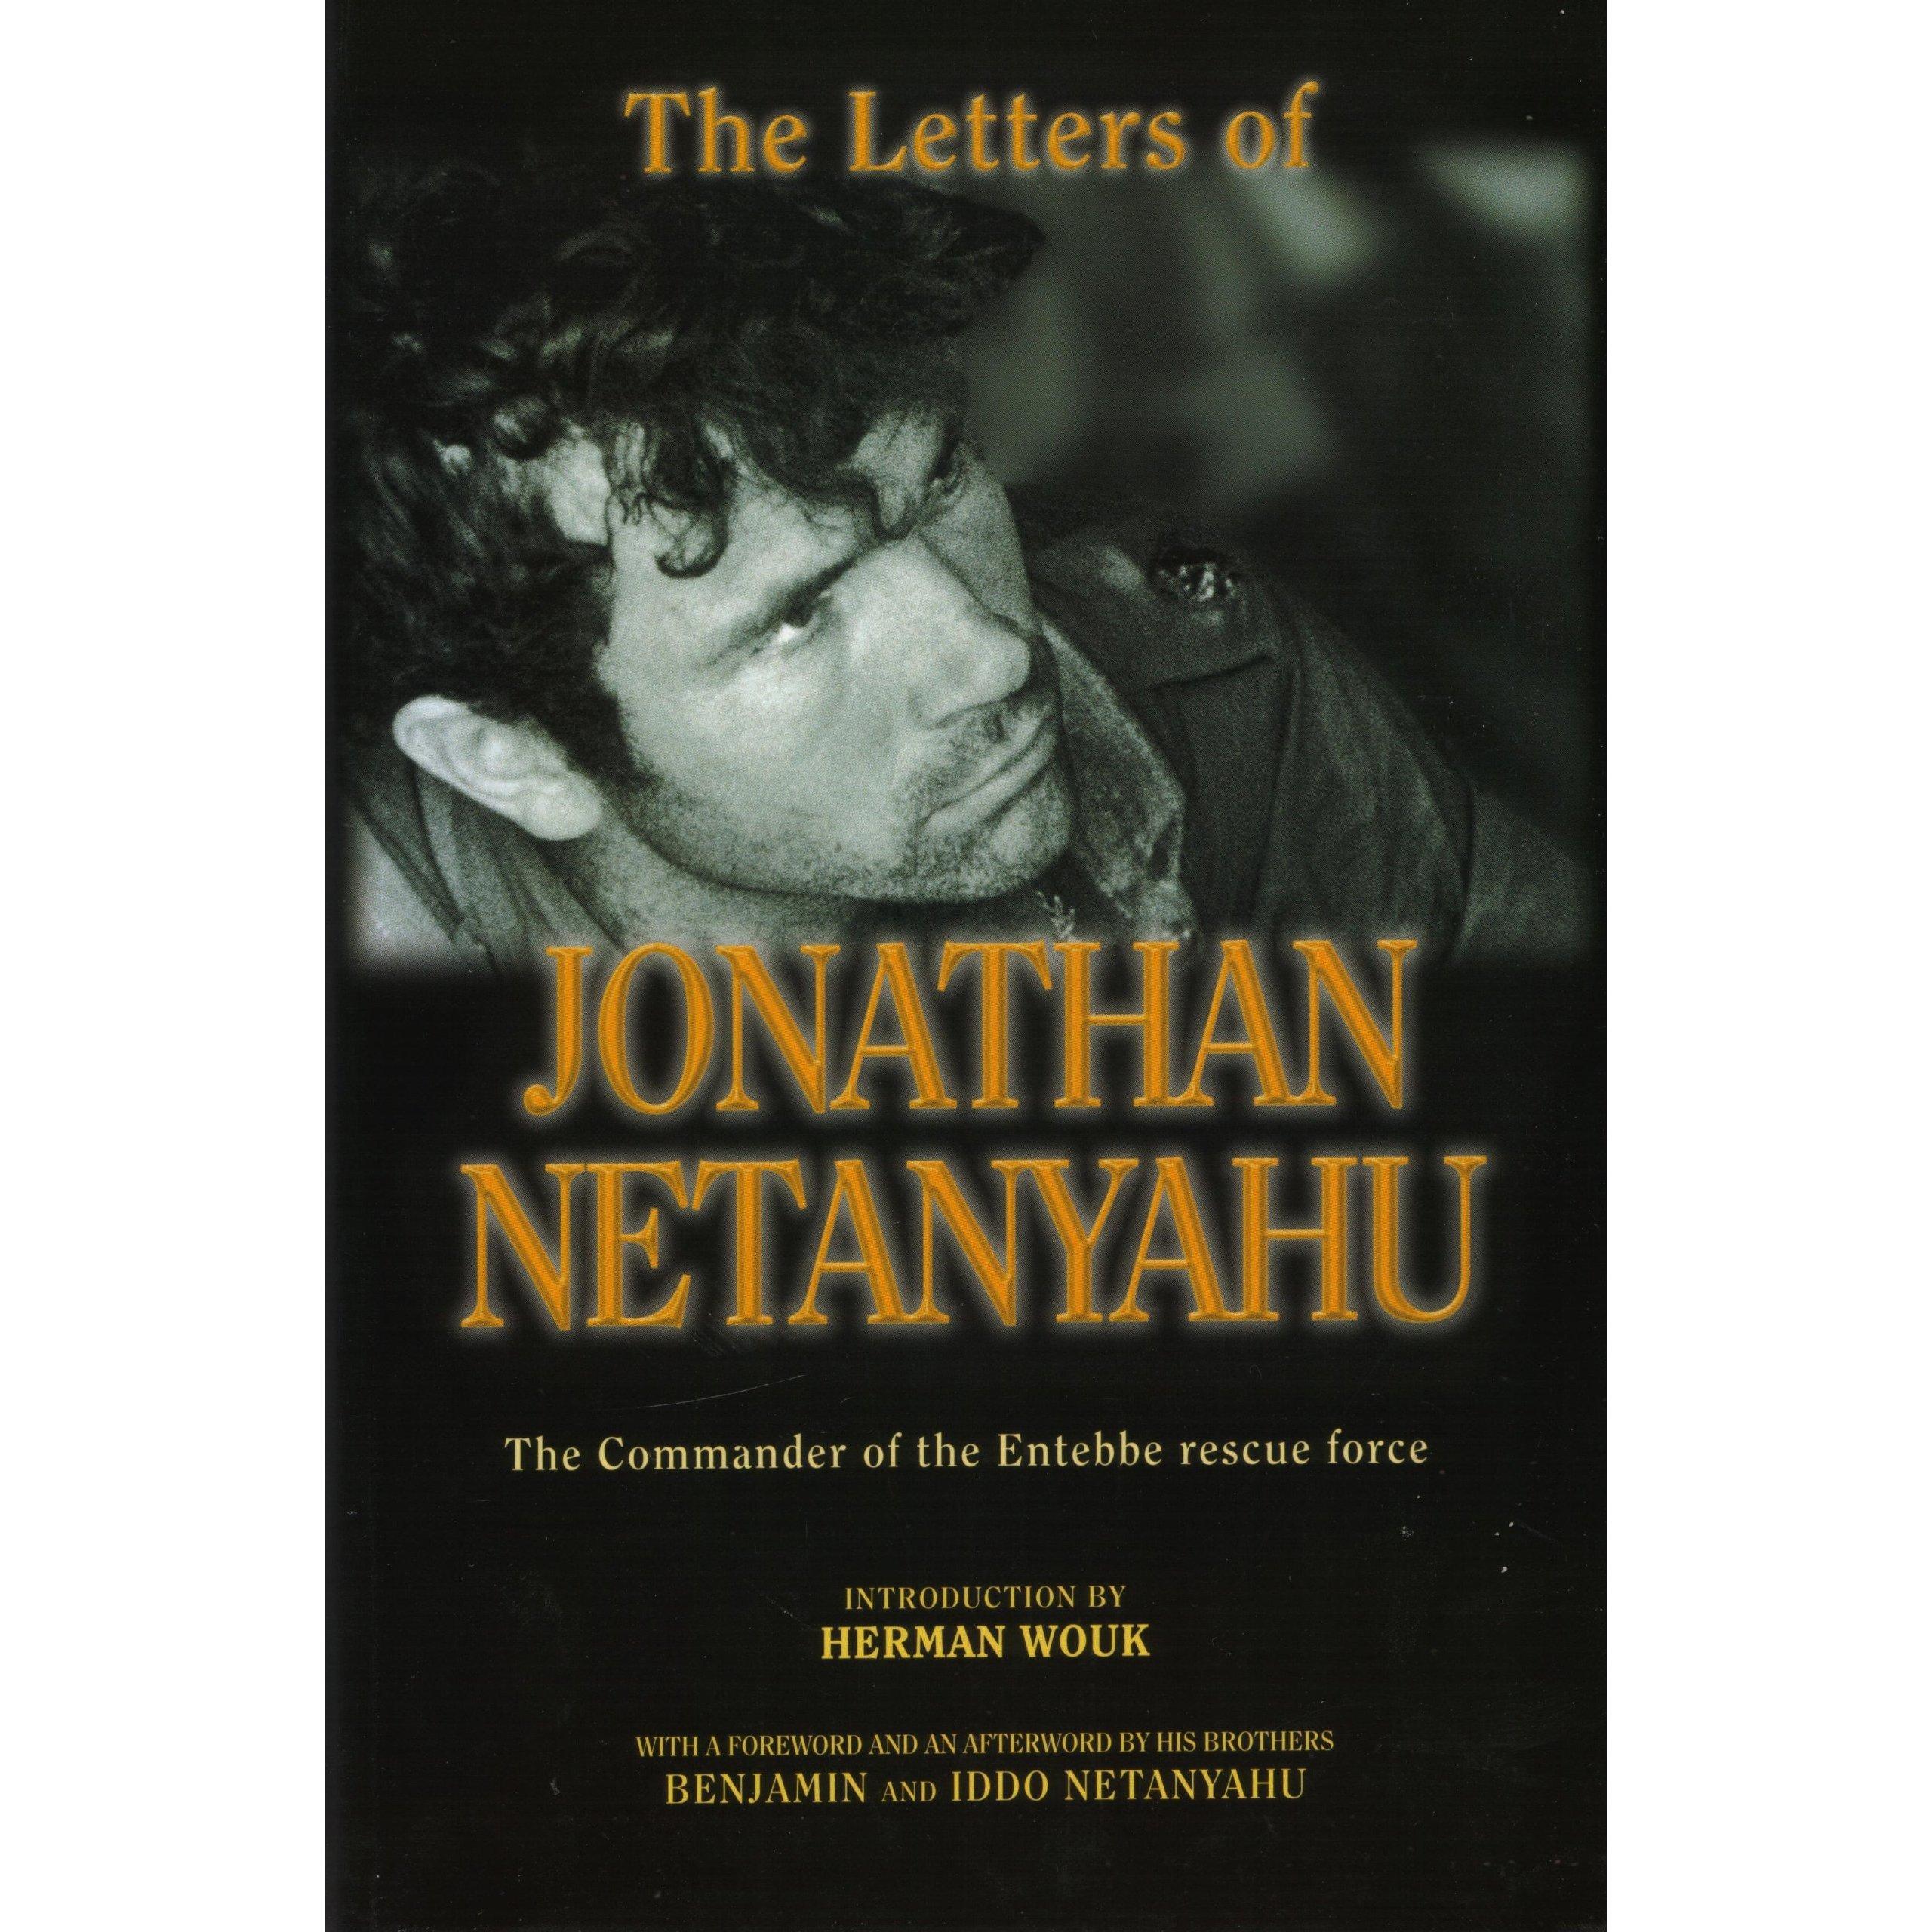 lettersofnetanyahu